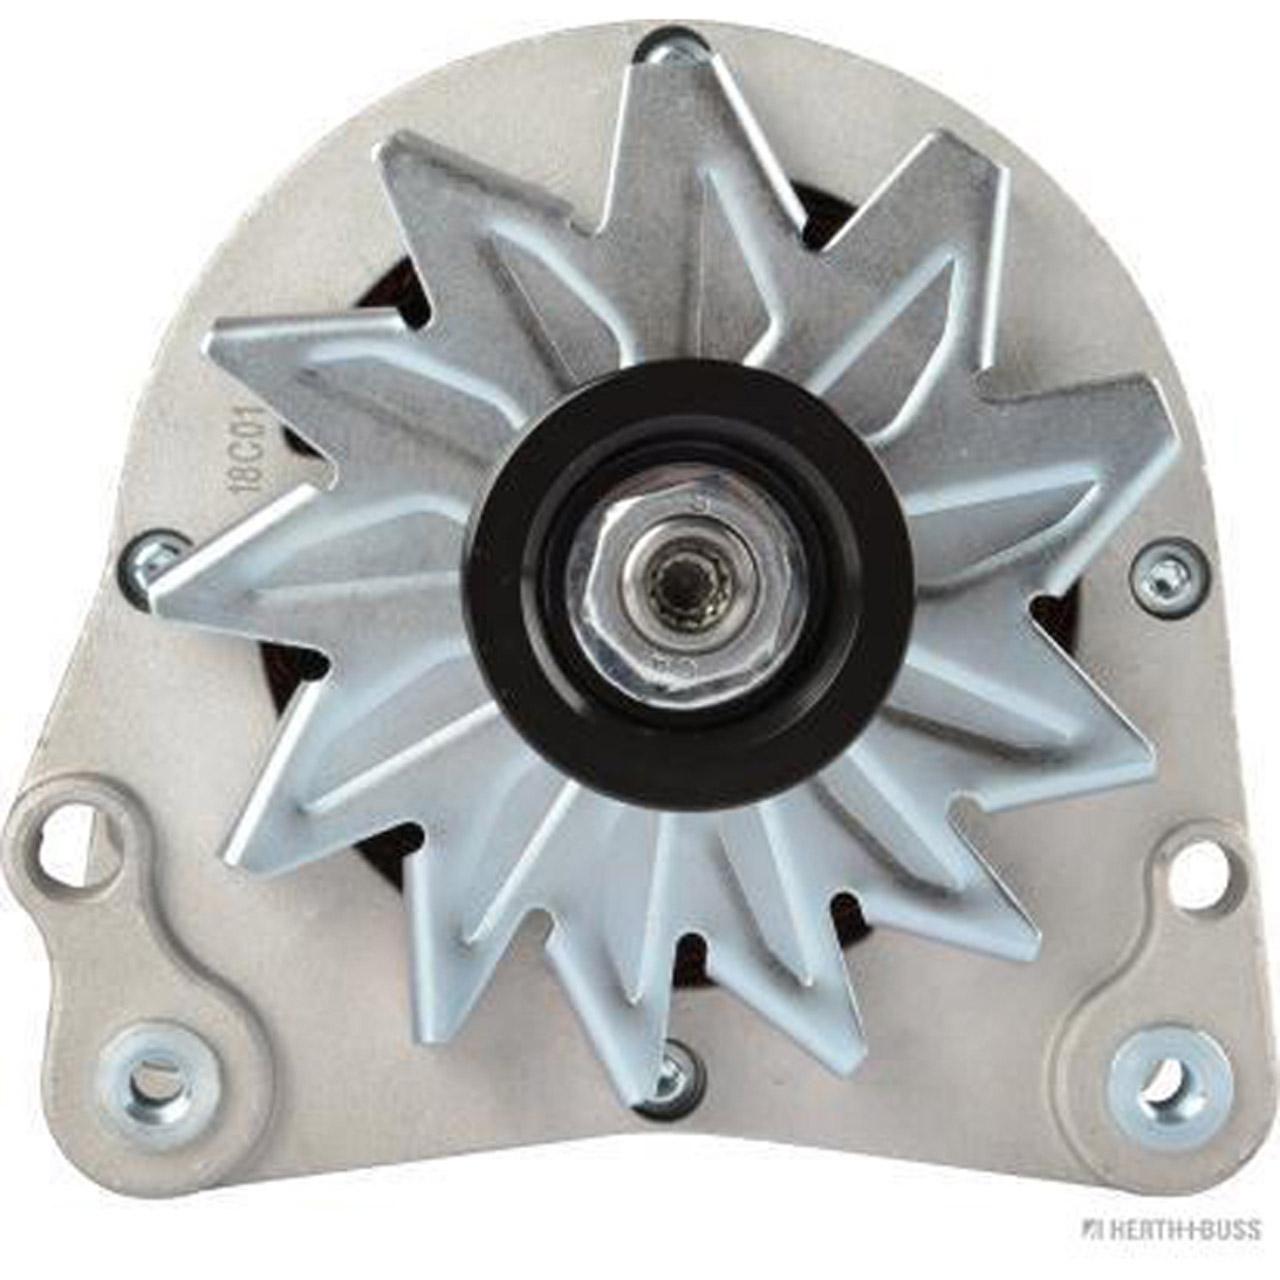 HERTH+BUSS Lichtmaschine Generator 14V 90A SKODA Felicia 1 2 1.3 54/58/68 PS